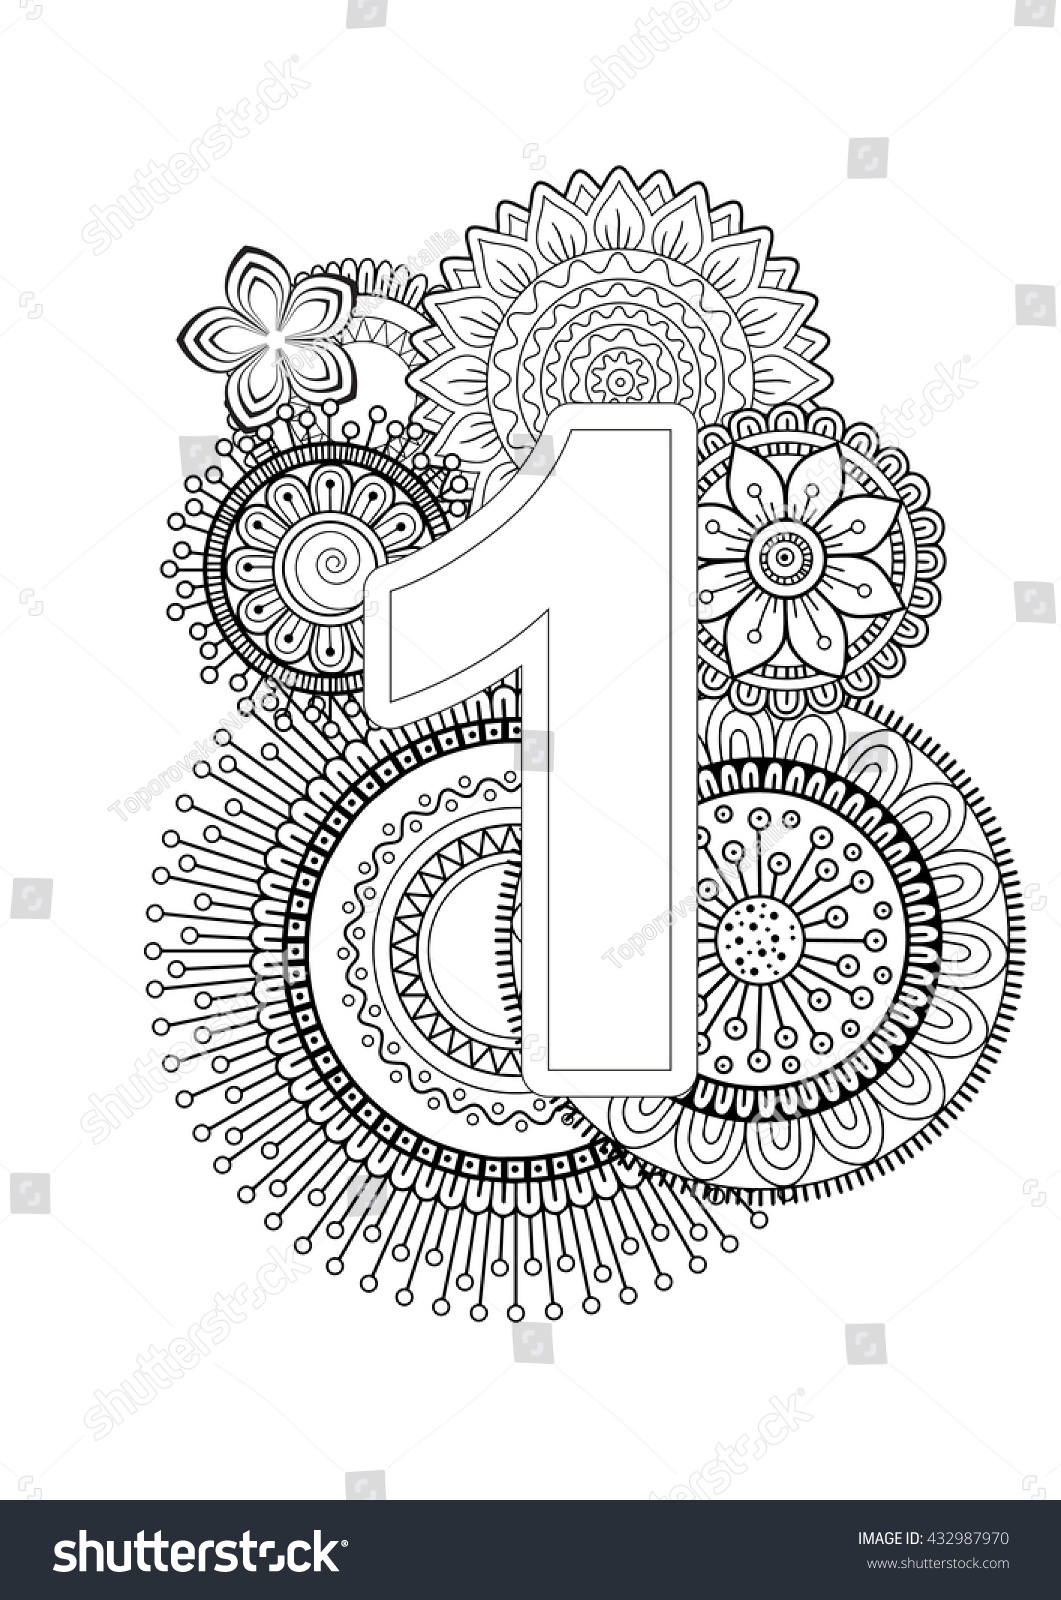 doodle floral letters coloring book adult stock vector 432987970 shutterstock. Black Bedroom Furniture Sets. Home Design Ideas